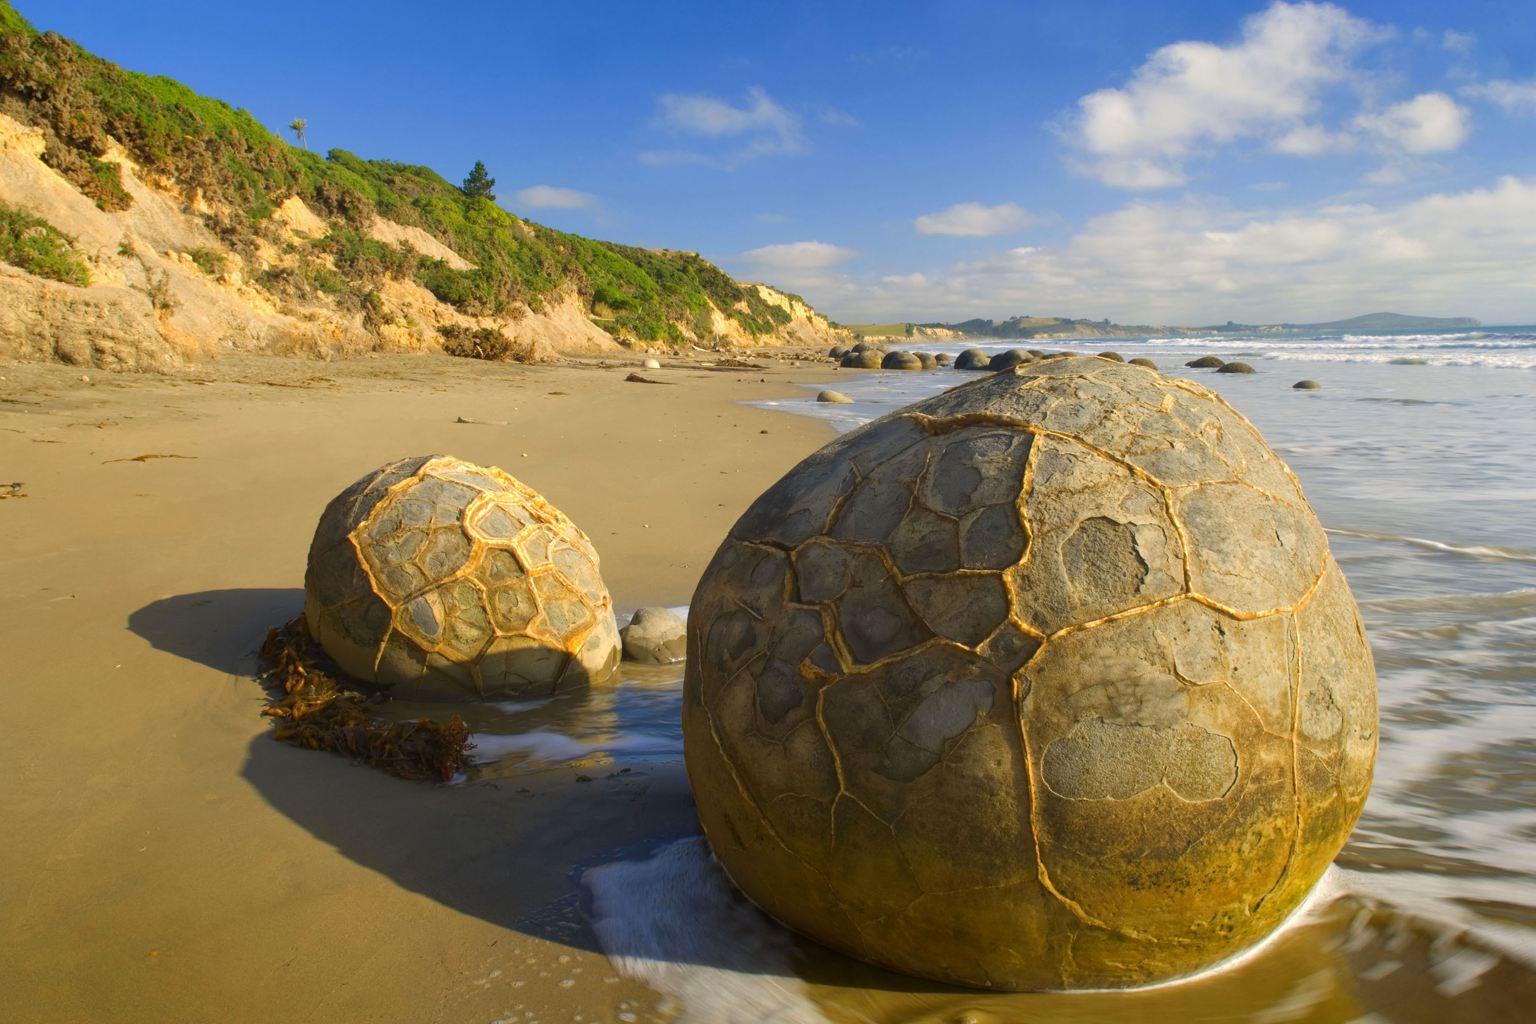 moeraki boulders of new zealand